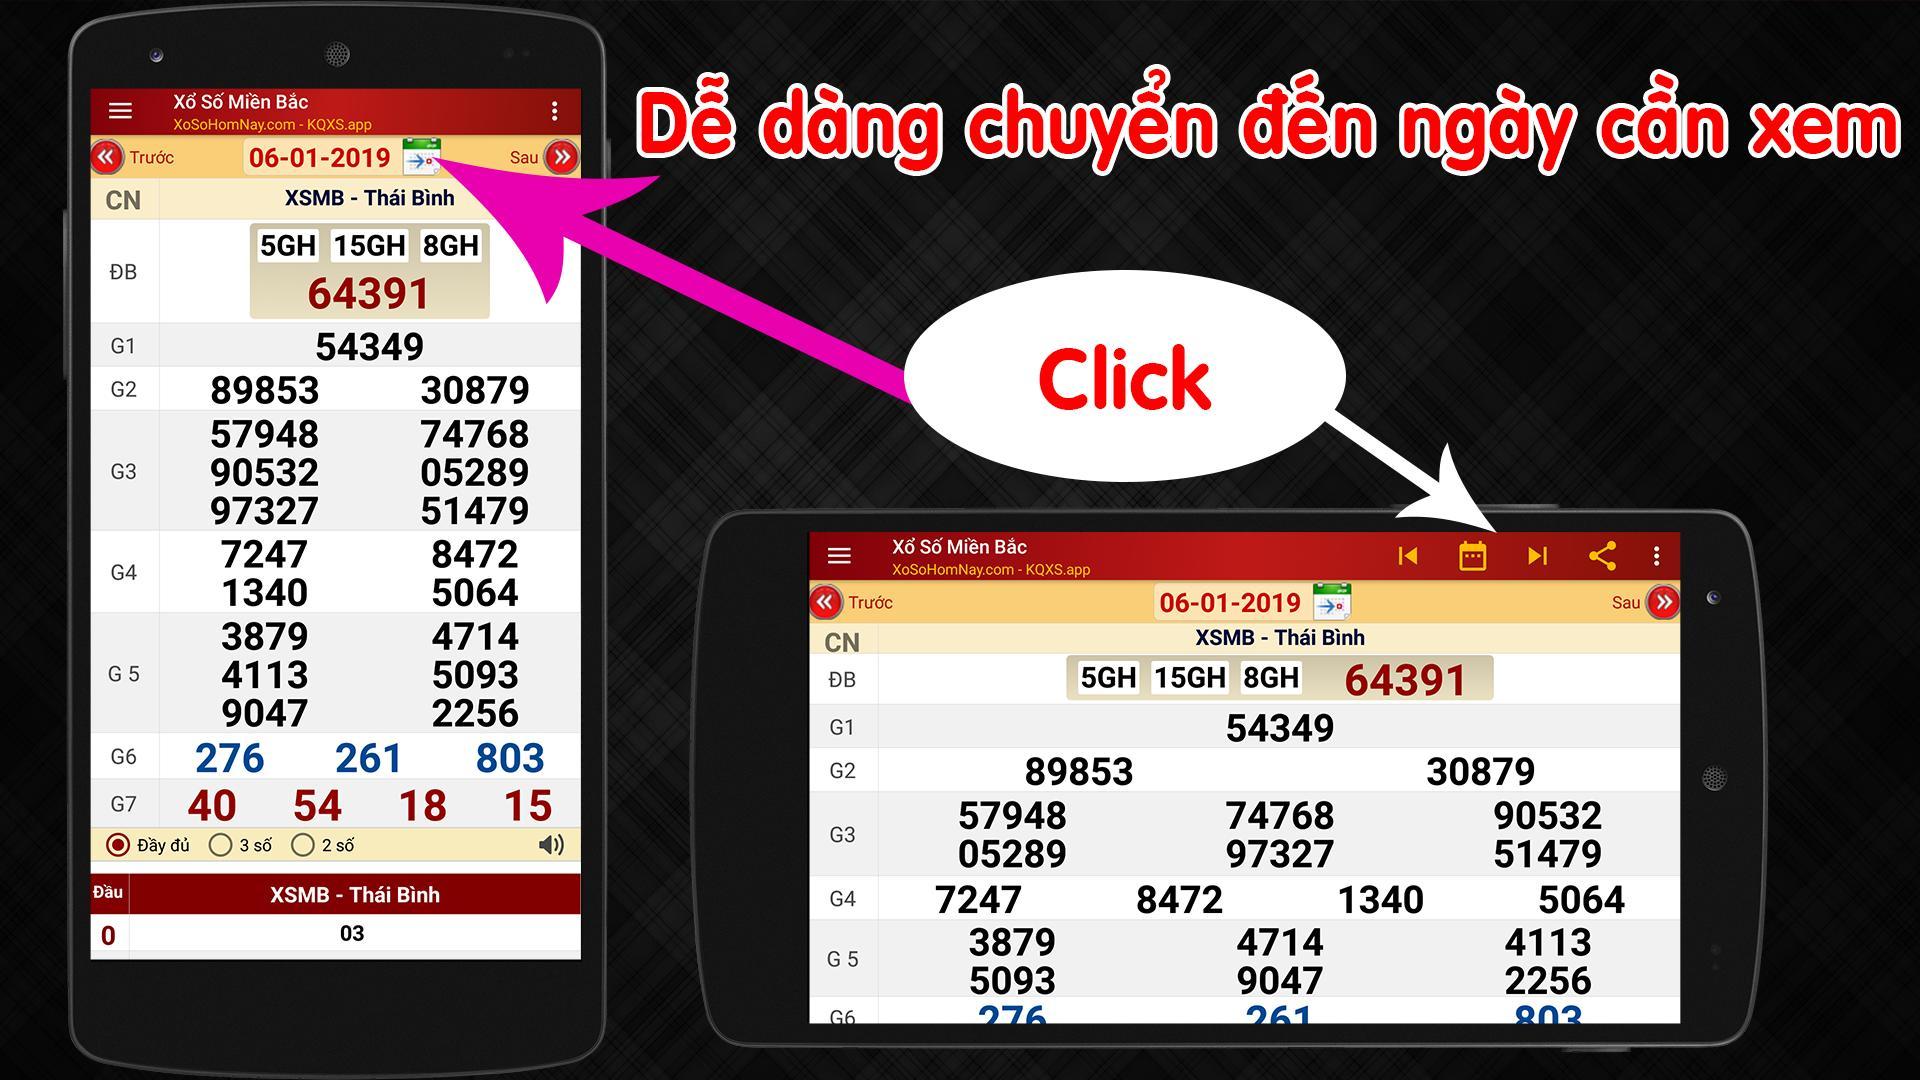 Xổ Số Hom Nay Trực Tiếp Kqxs Xsmn Xsmb Vietlott Para Android Apk Baixar